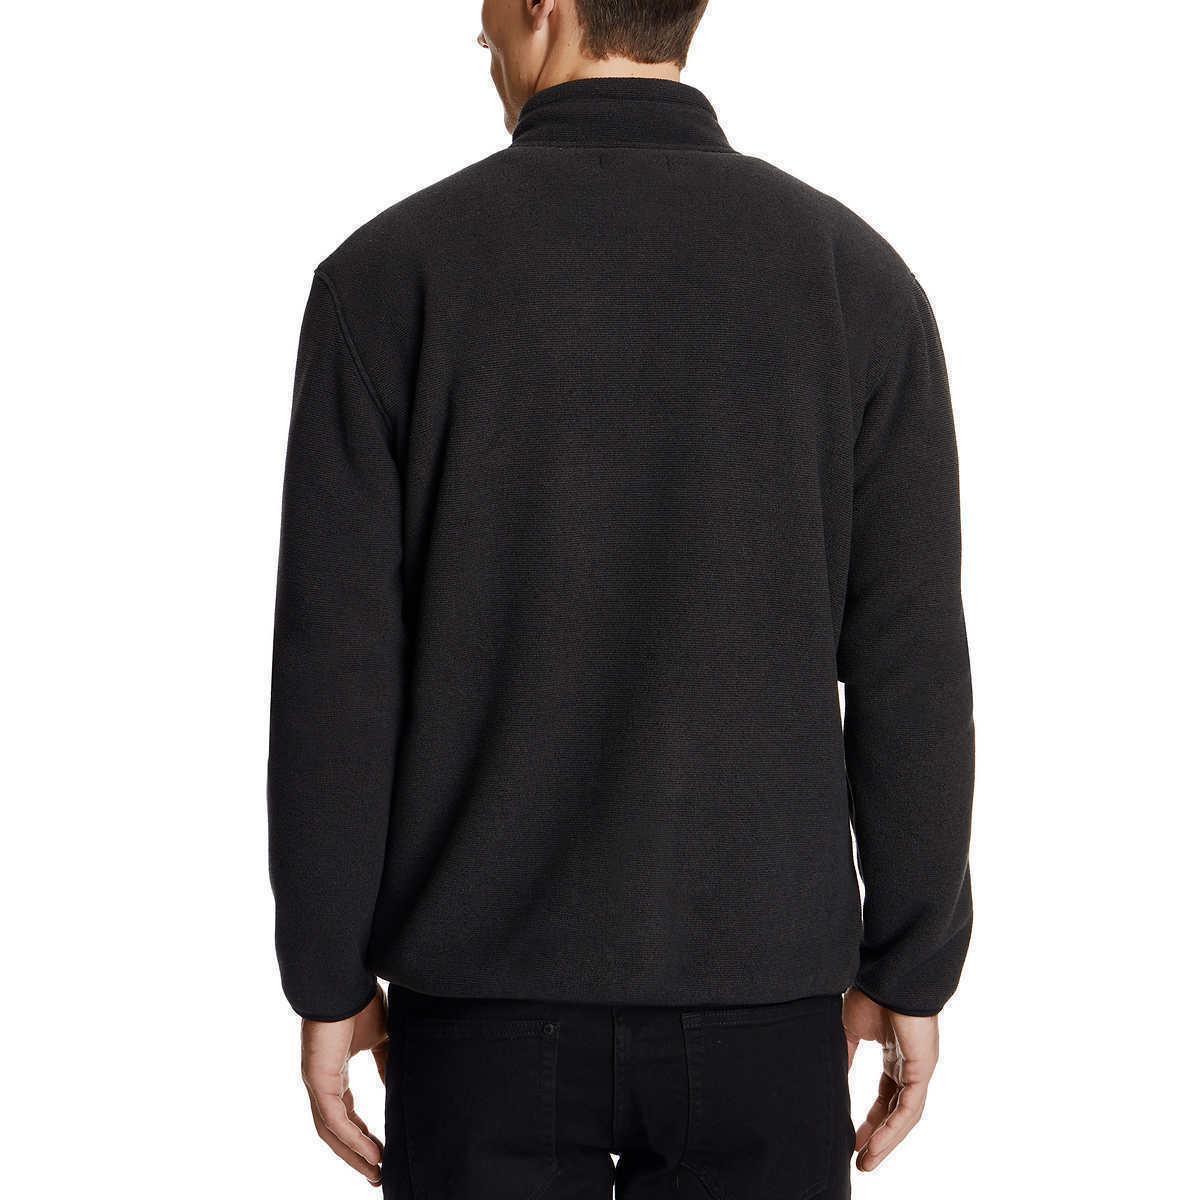 Soft Lined Jacket Chest-Pocket VARIETY